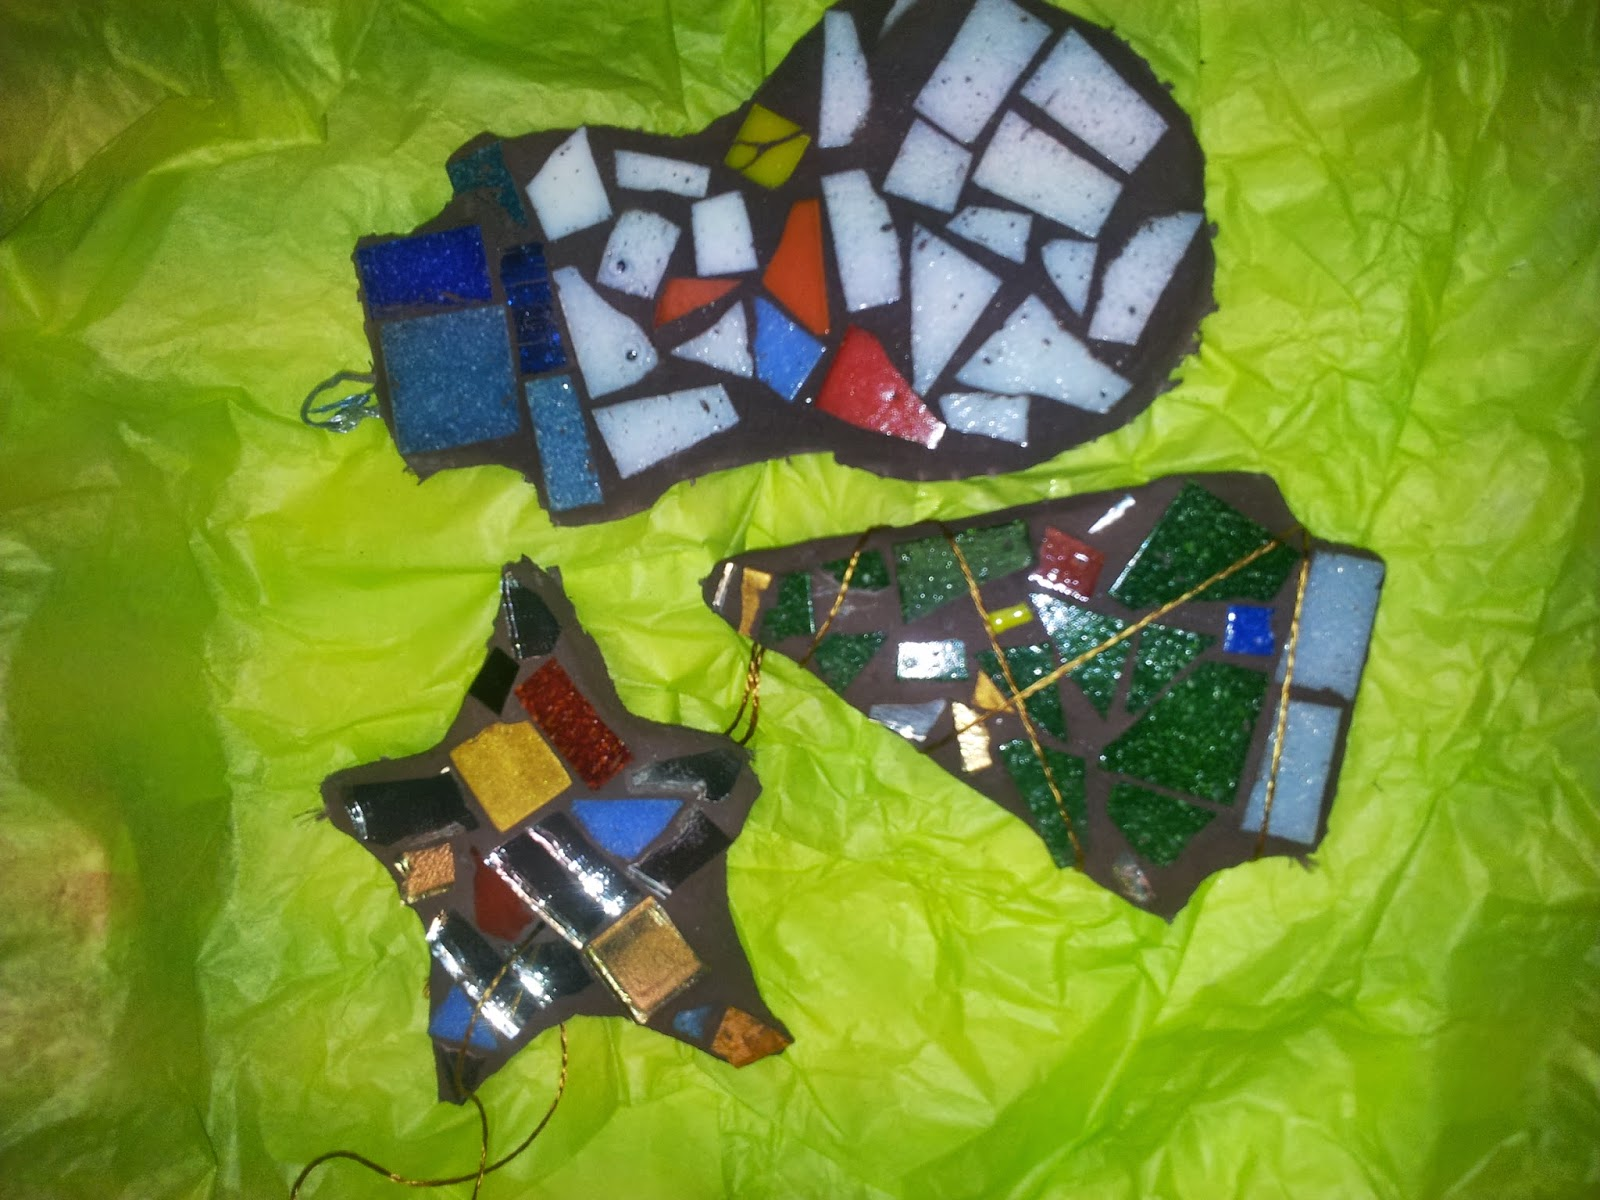 mosaic christmas decorations, mosaic workshop